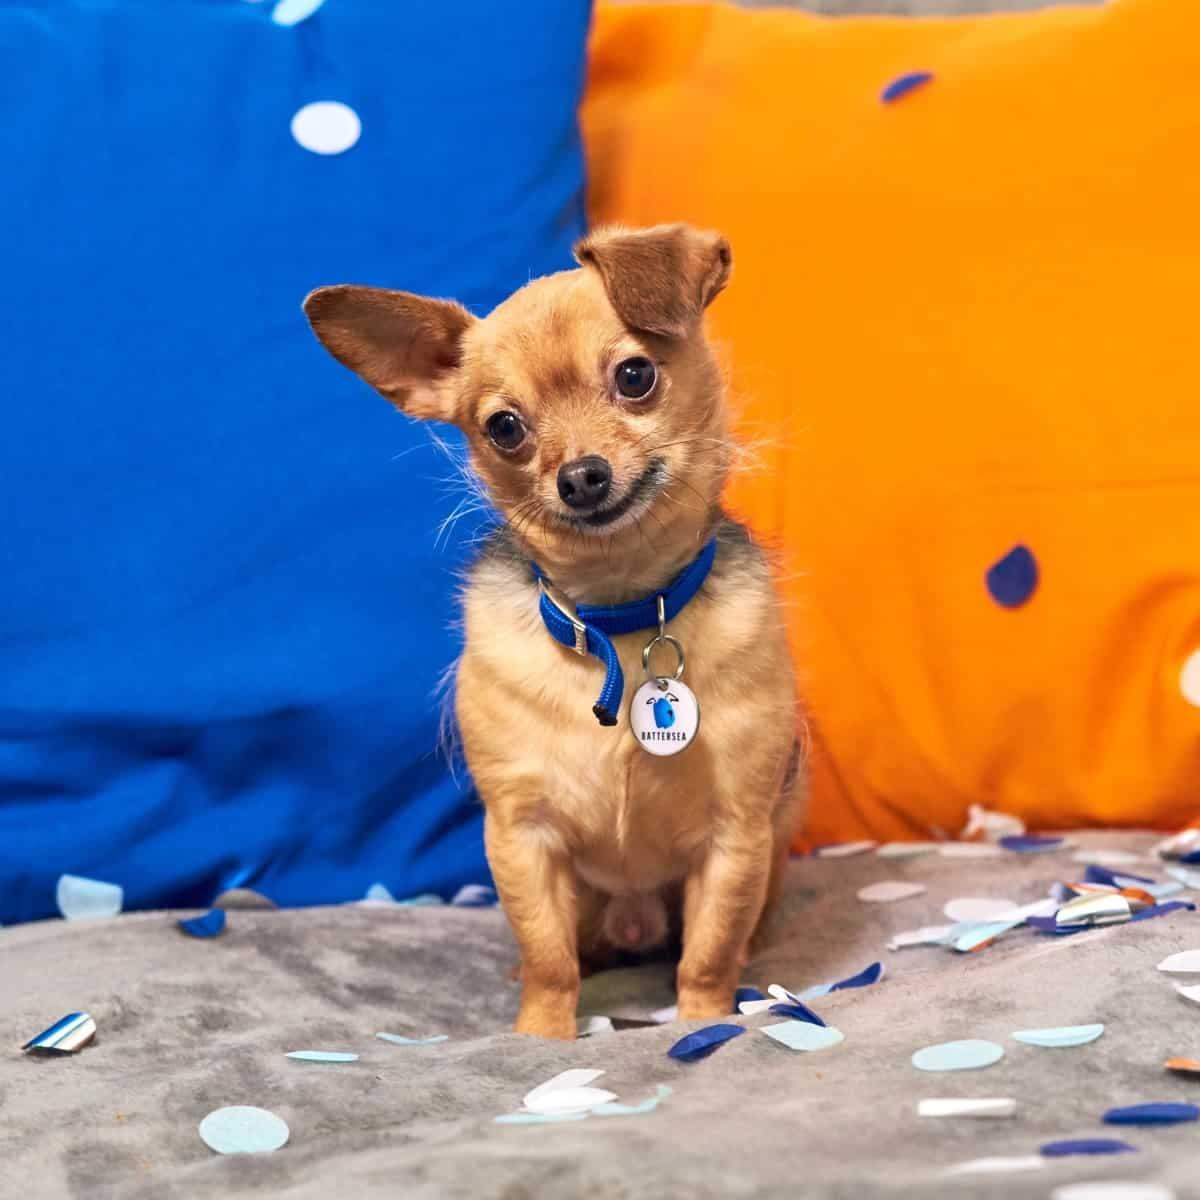 Adopt A Dog - Battersea